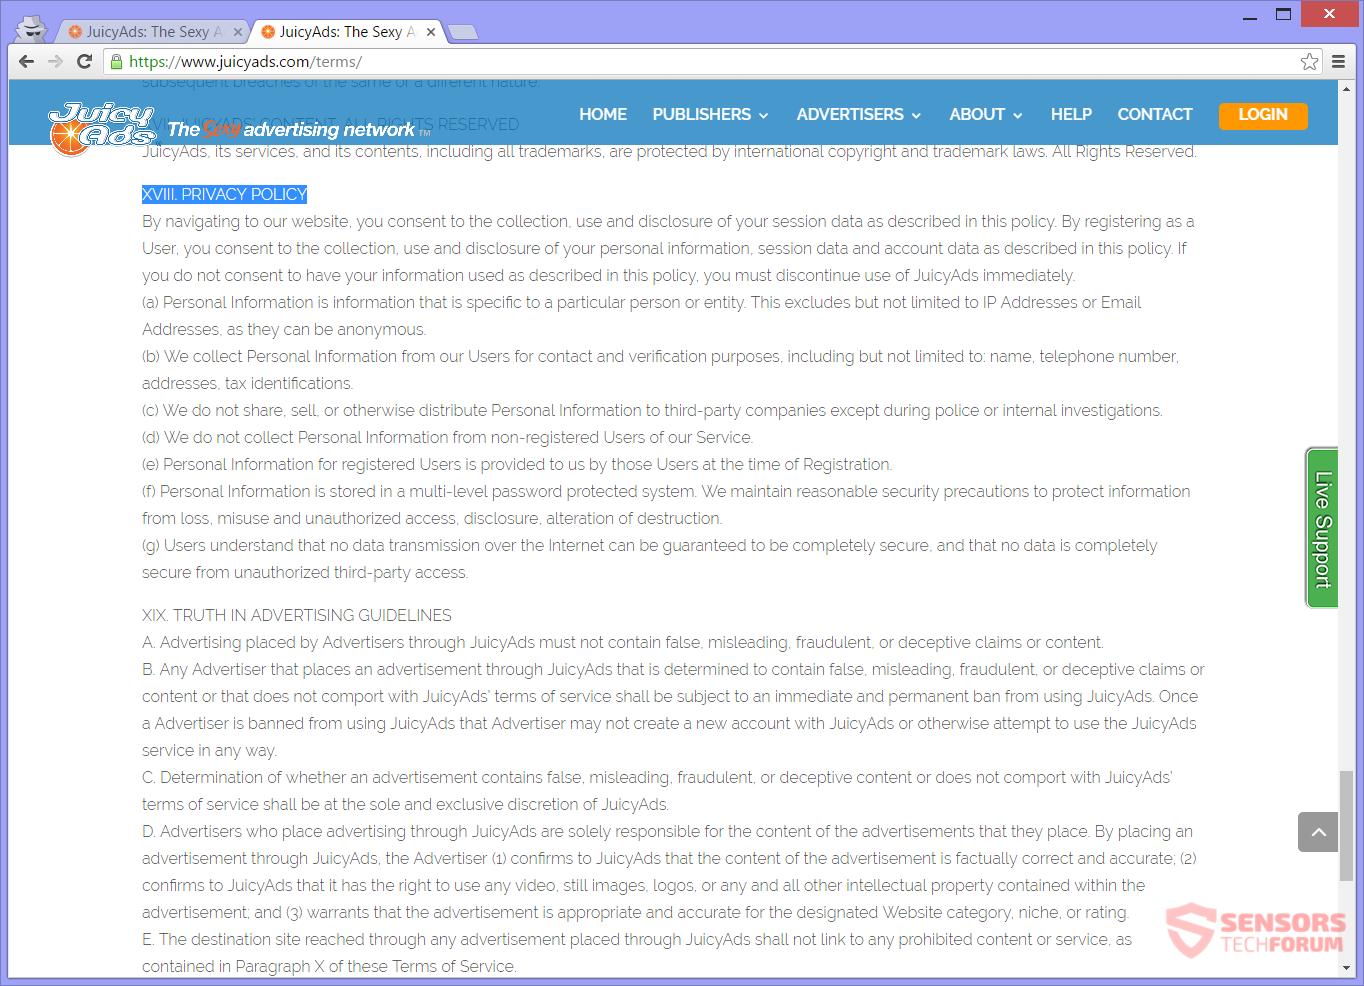 STF-juicyads-com-juicy-ads-adware-privacy-policy